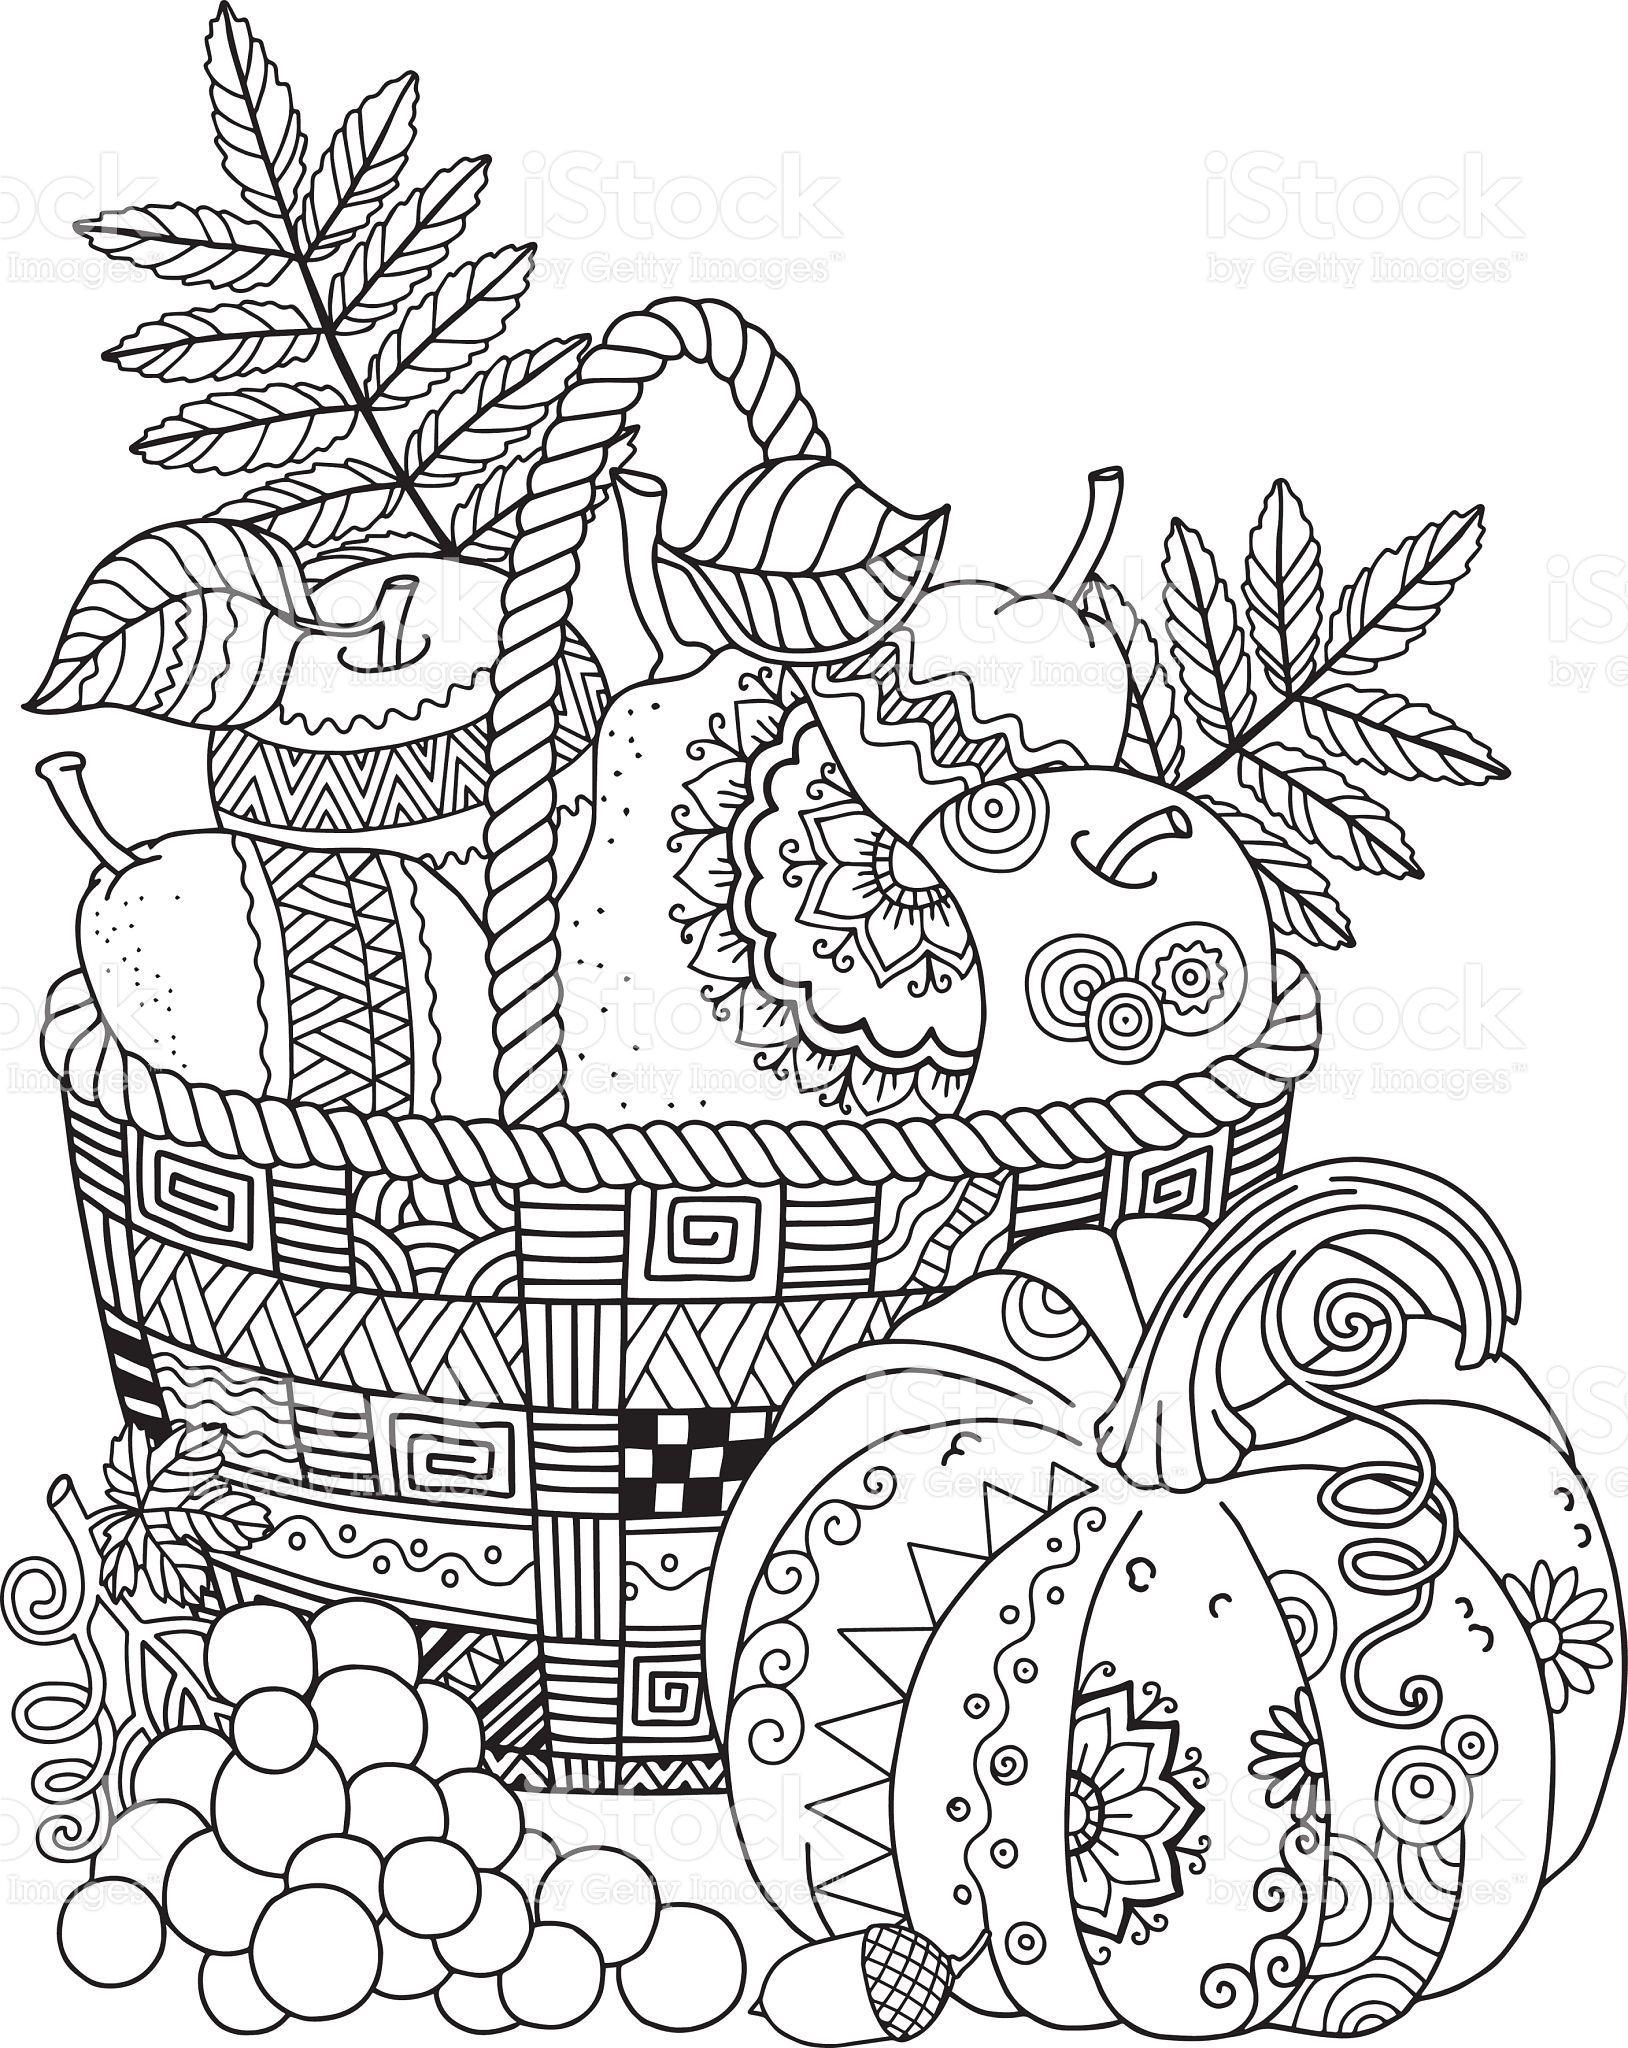 Basket With Harvest Fruits Pumpkin And G